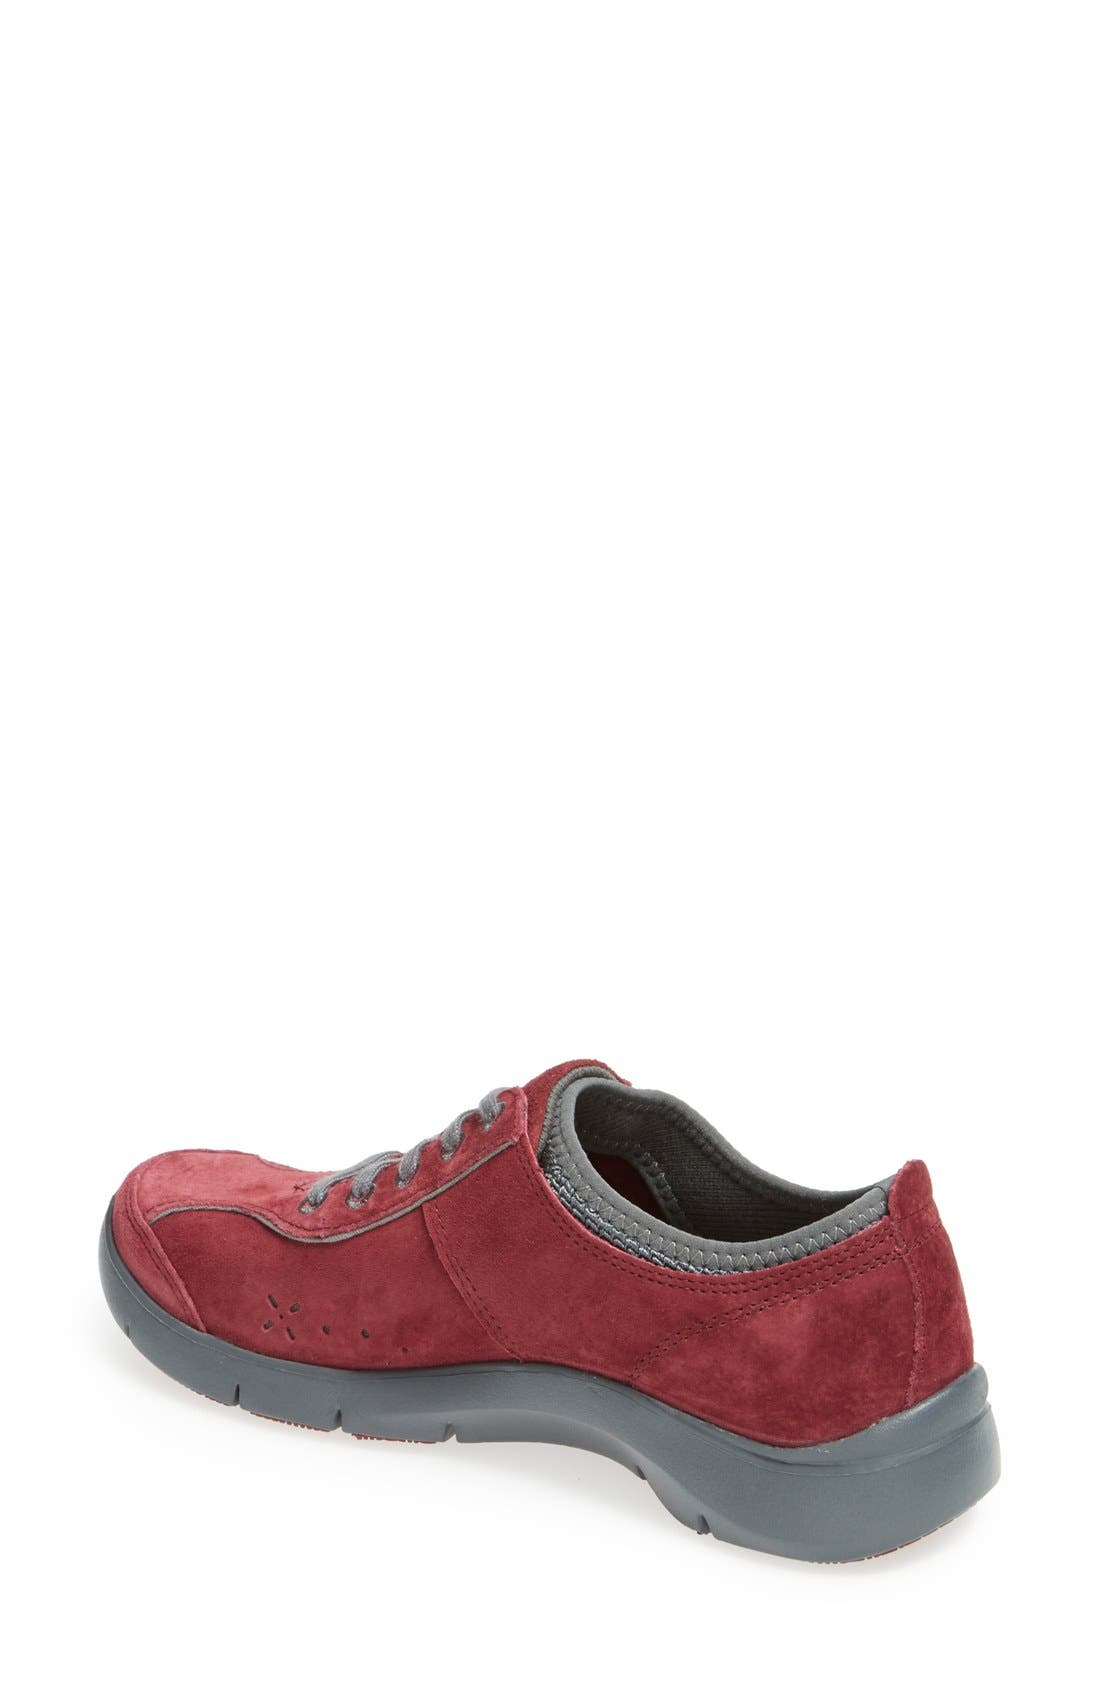 Alternate Image 2  - Dansko 'Elise' Sneaker